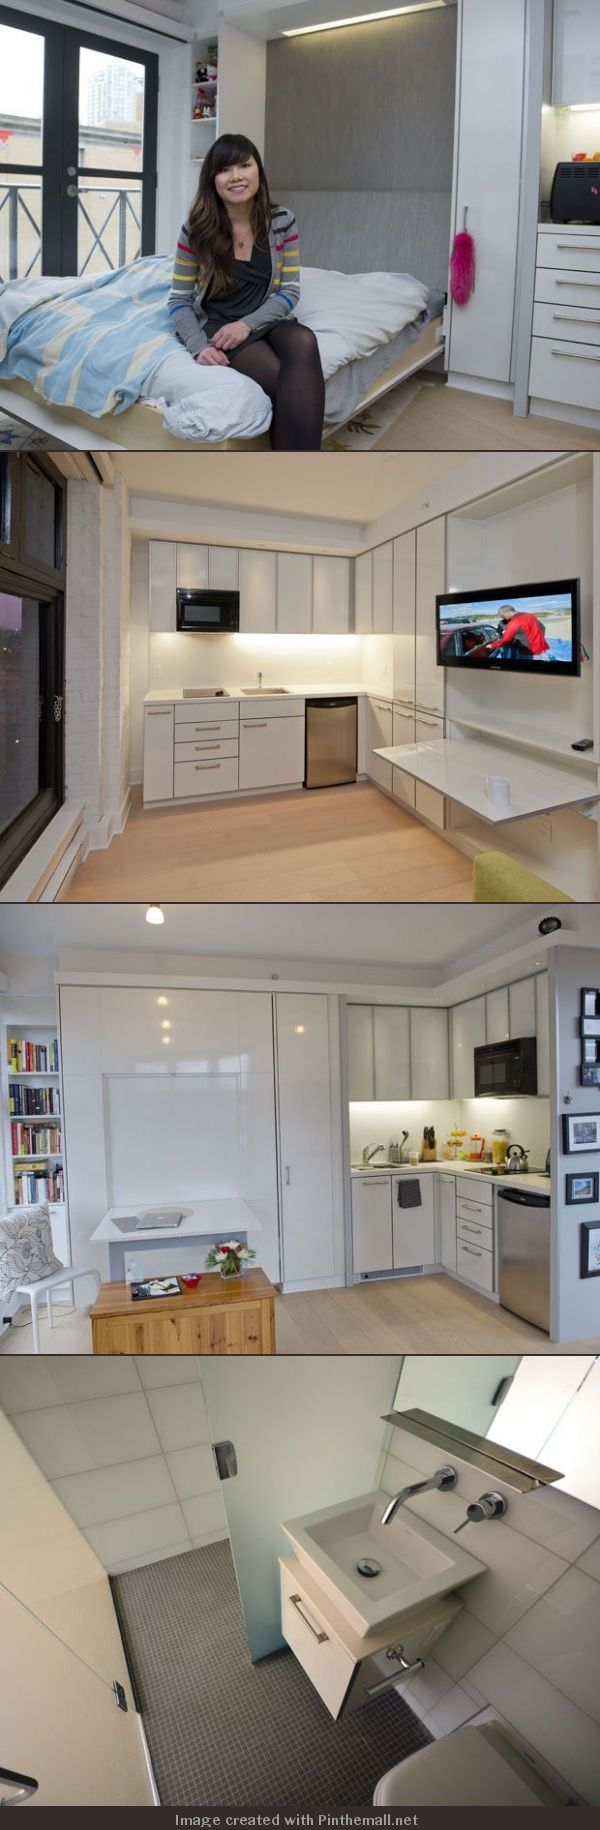 Pin By Rona C On Decor Small Apartments Small Room Interior Tiny House Design